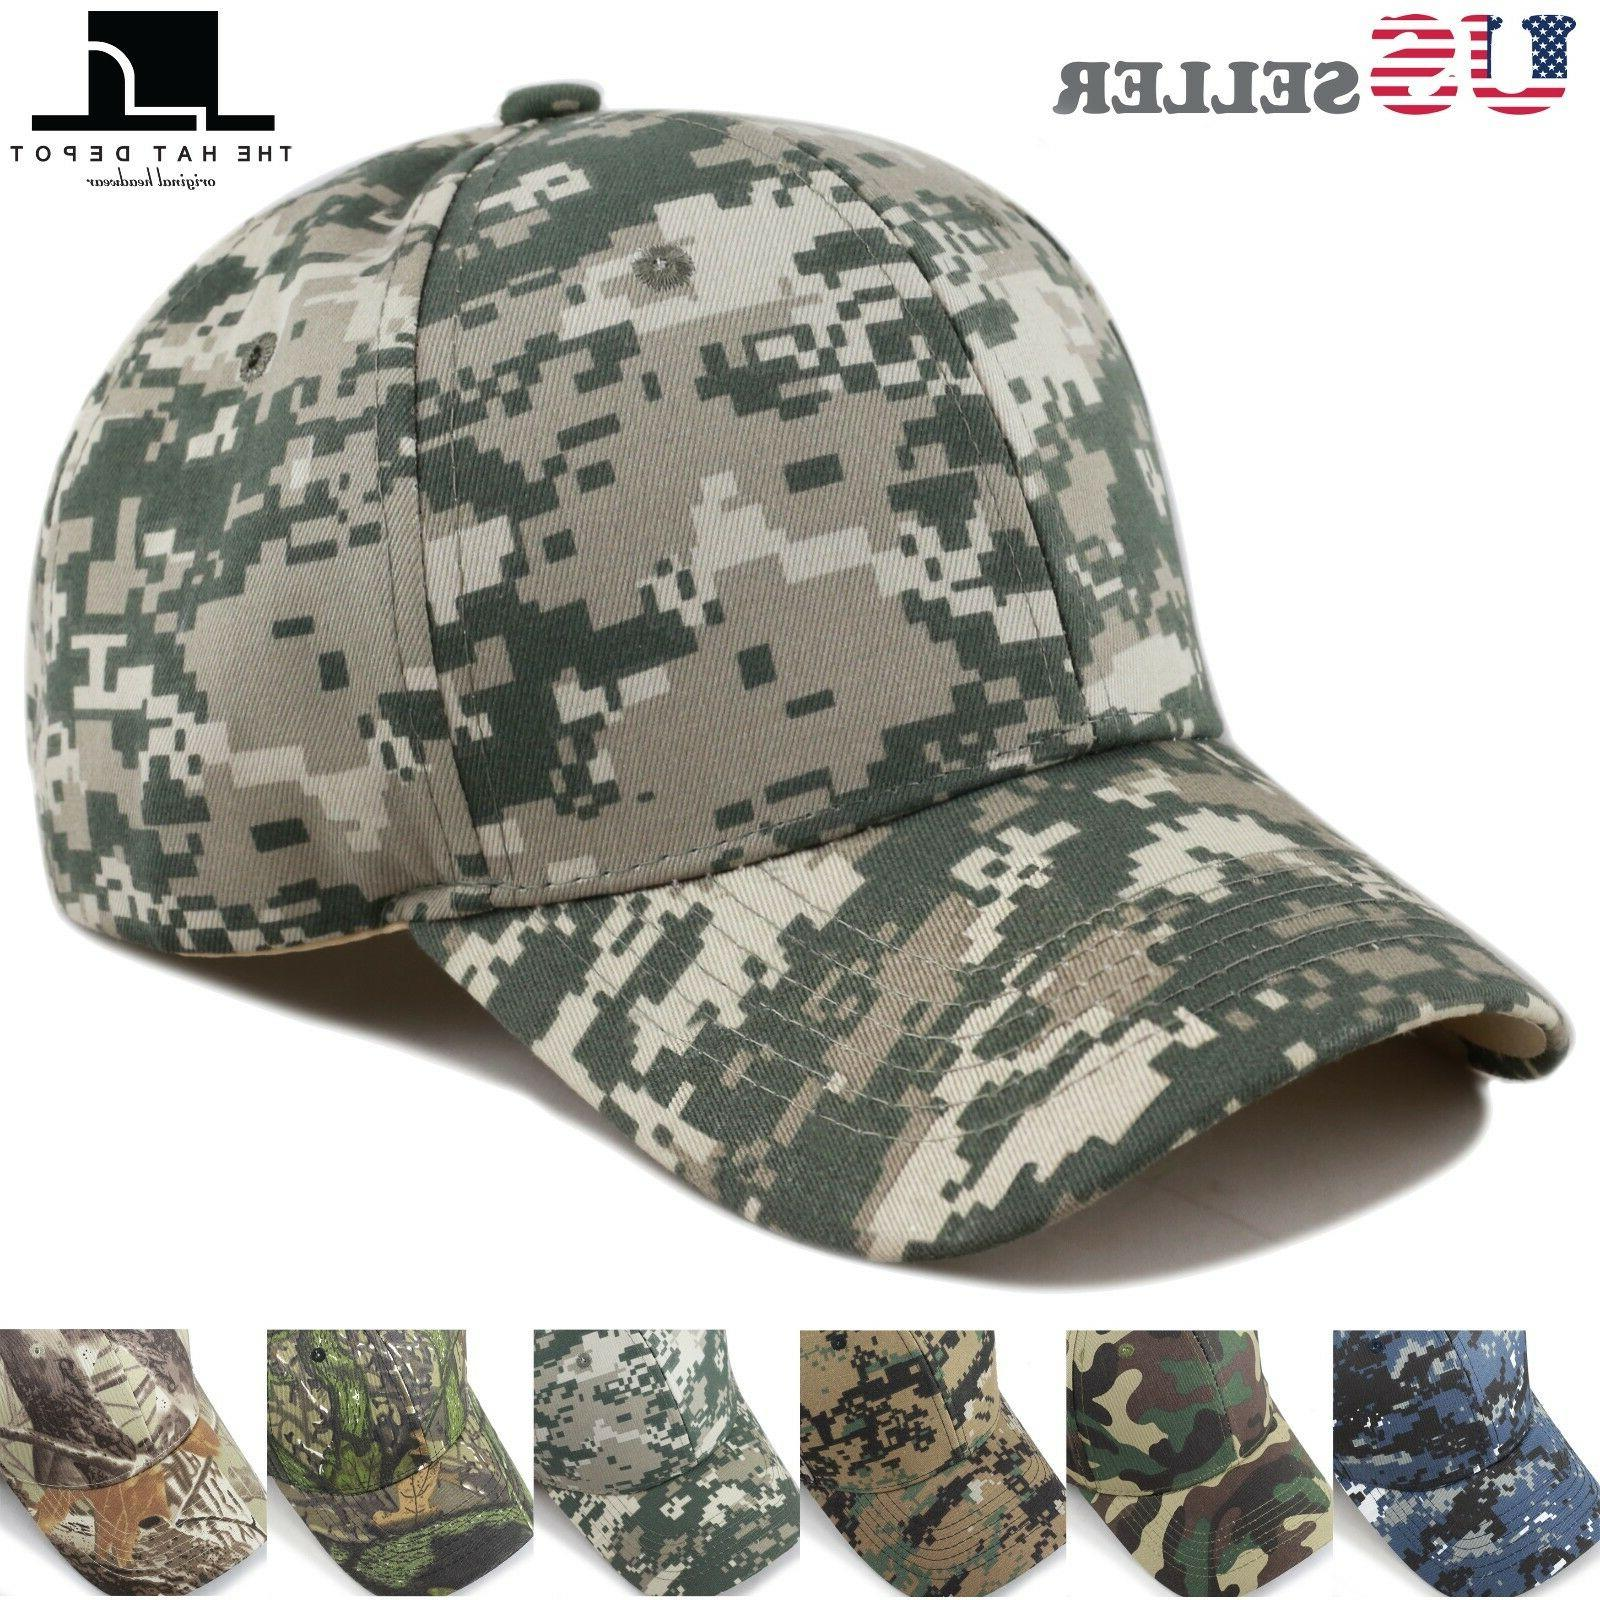 THE HAT DEPOT Mens Plain Camouflage Baseball Cap Adjustable